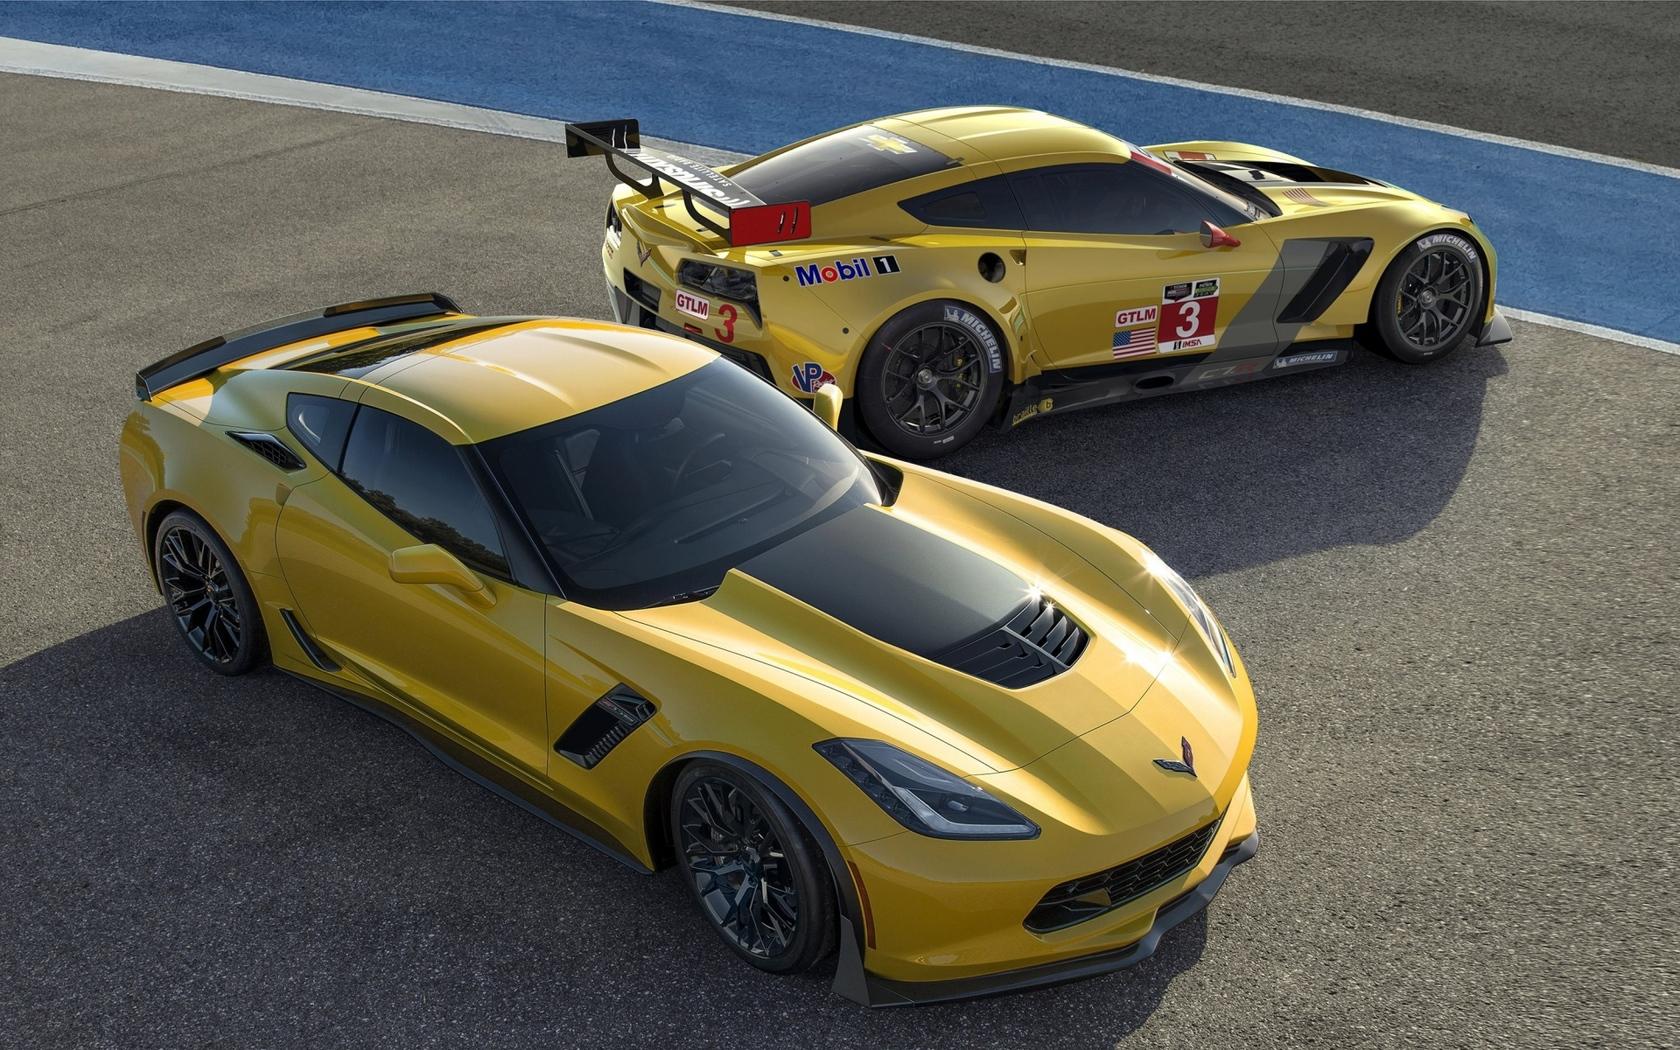 Chevrolet Corvette racing cars Widescreen Wallpaper   20295 1680x1050